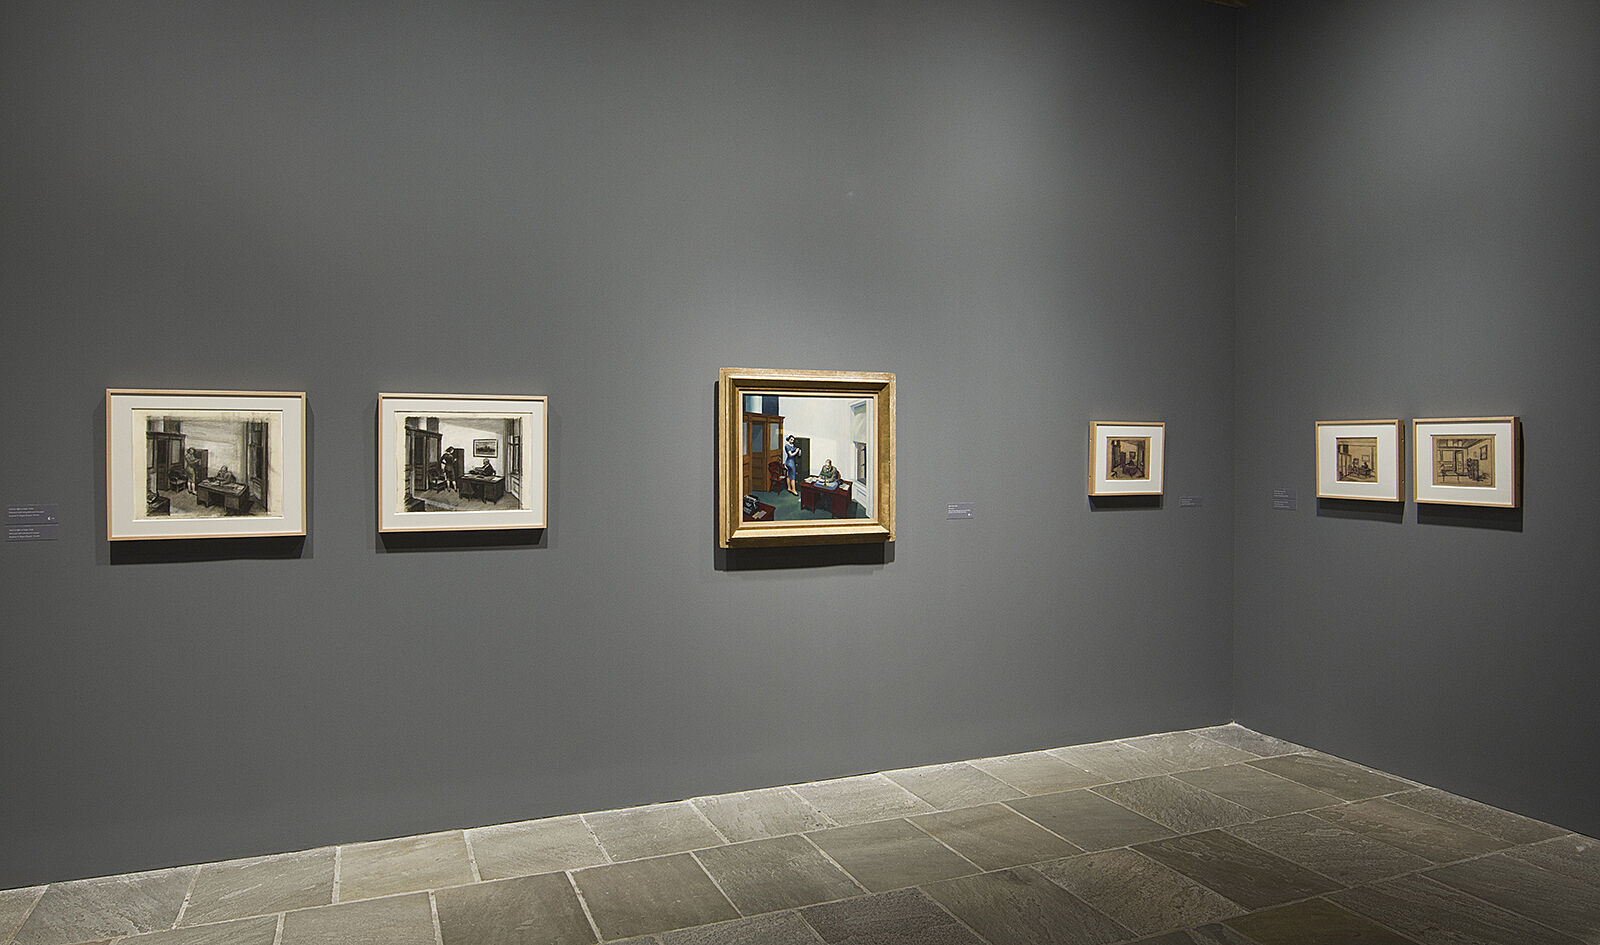 Painting and drawings hang against gray wall.